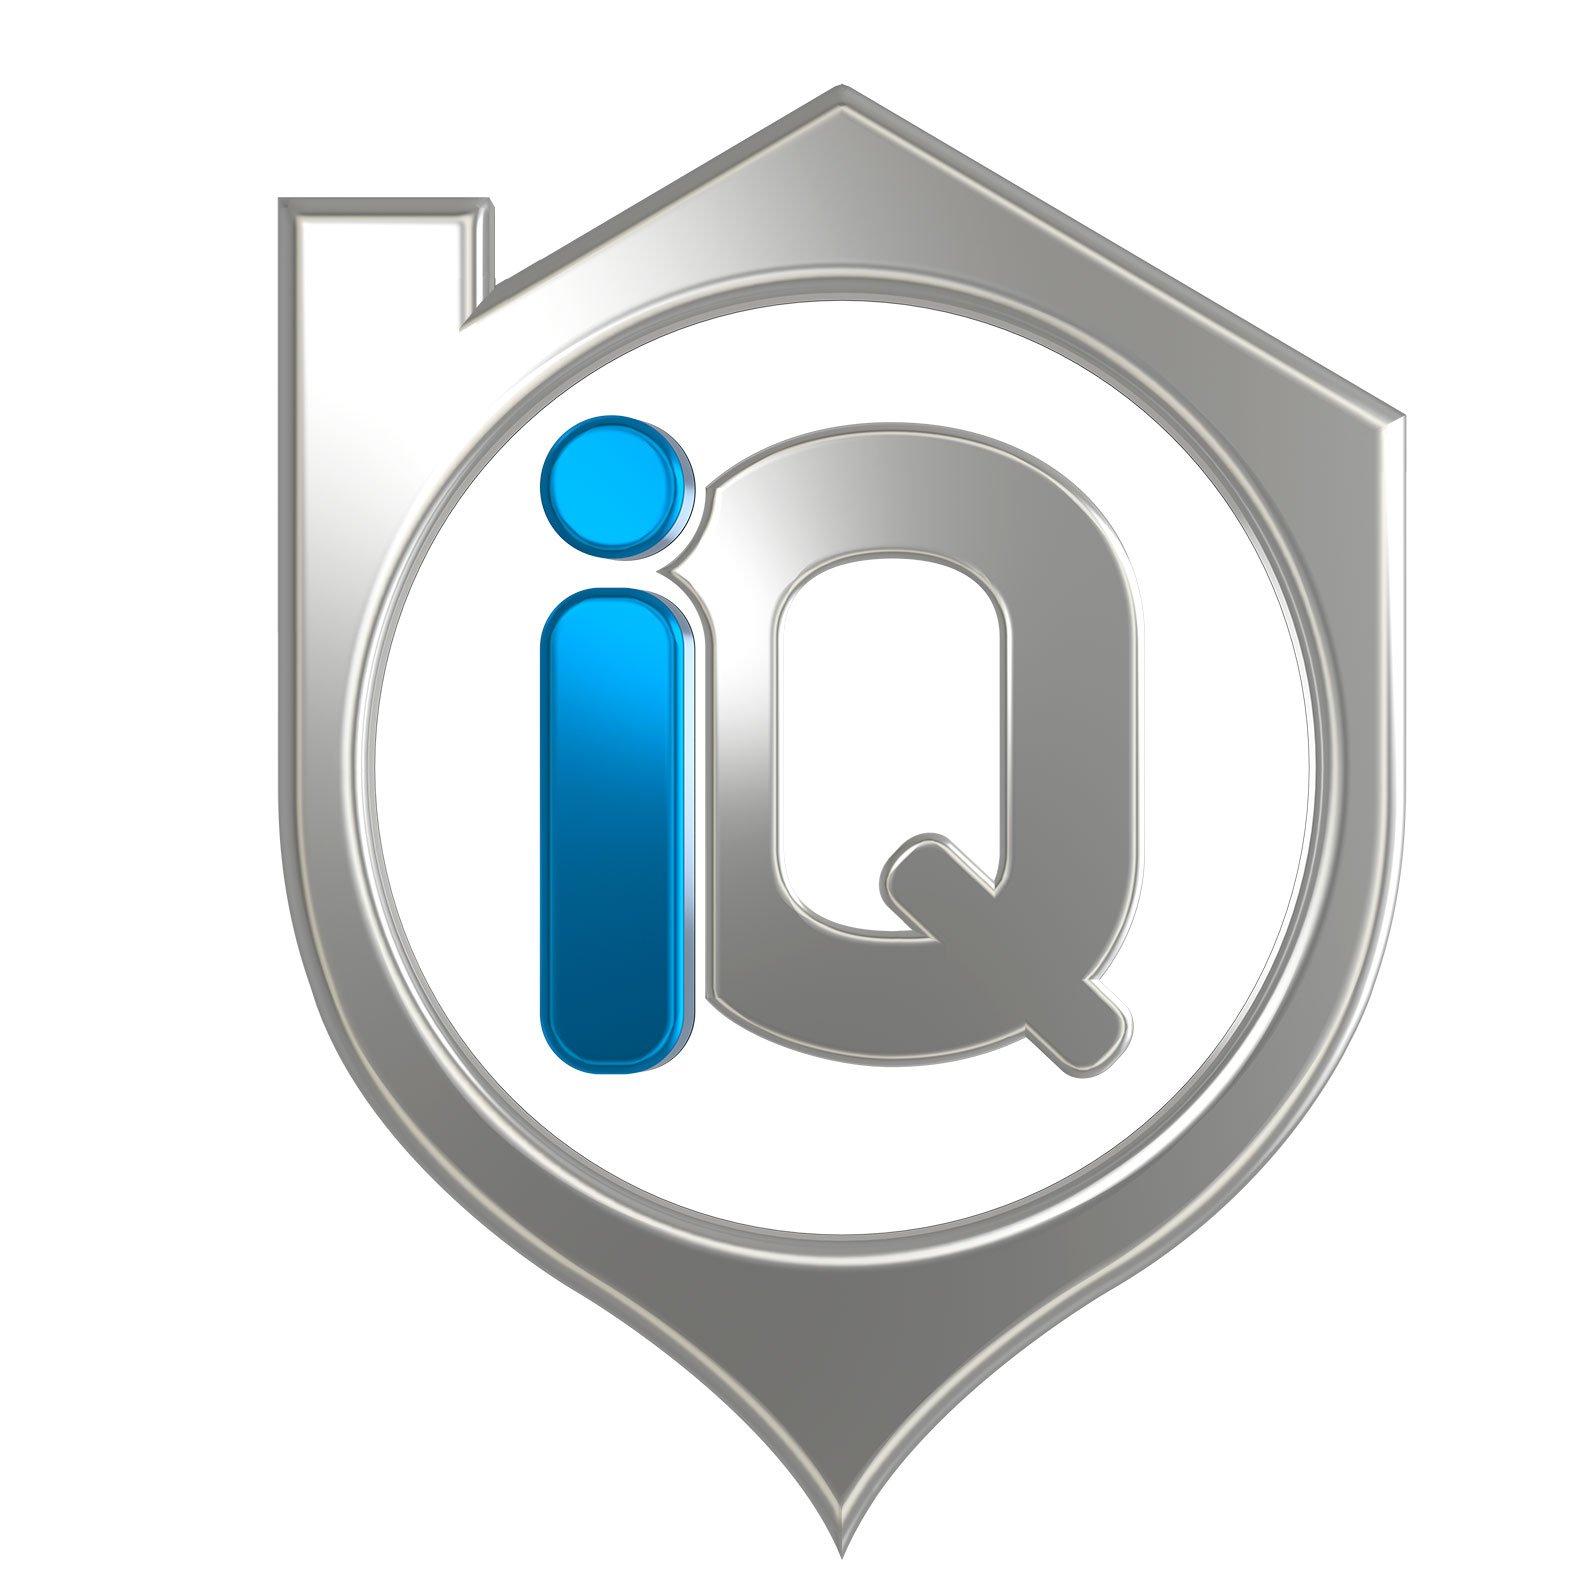 iq-makelaars